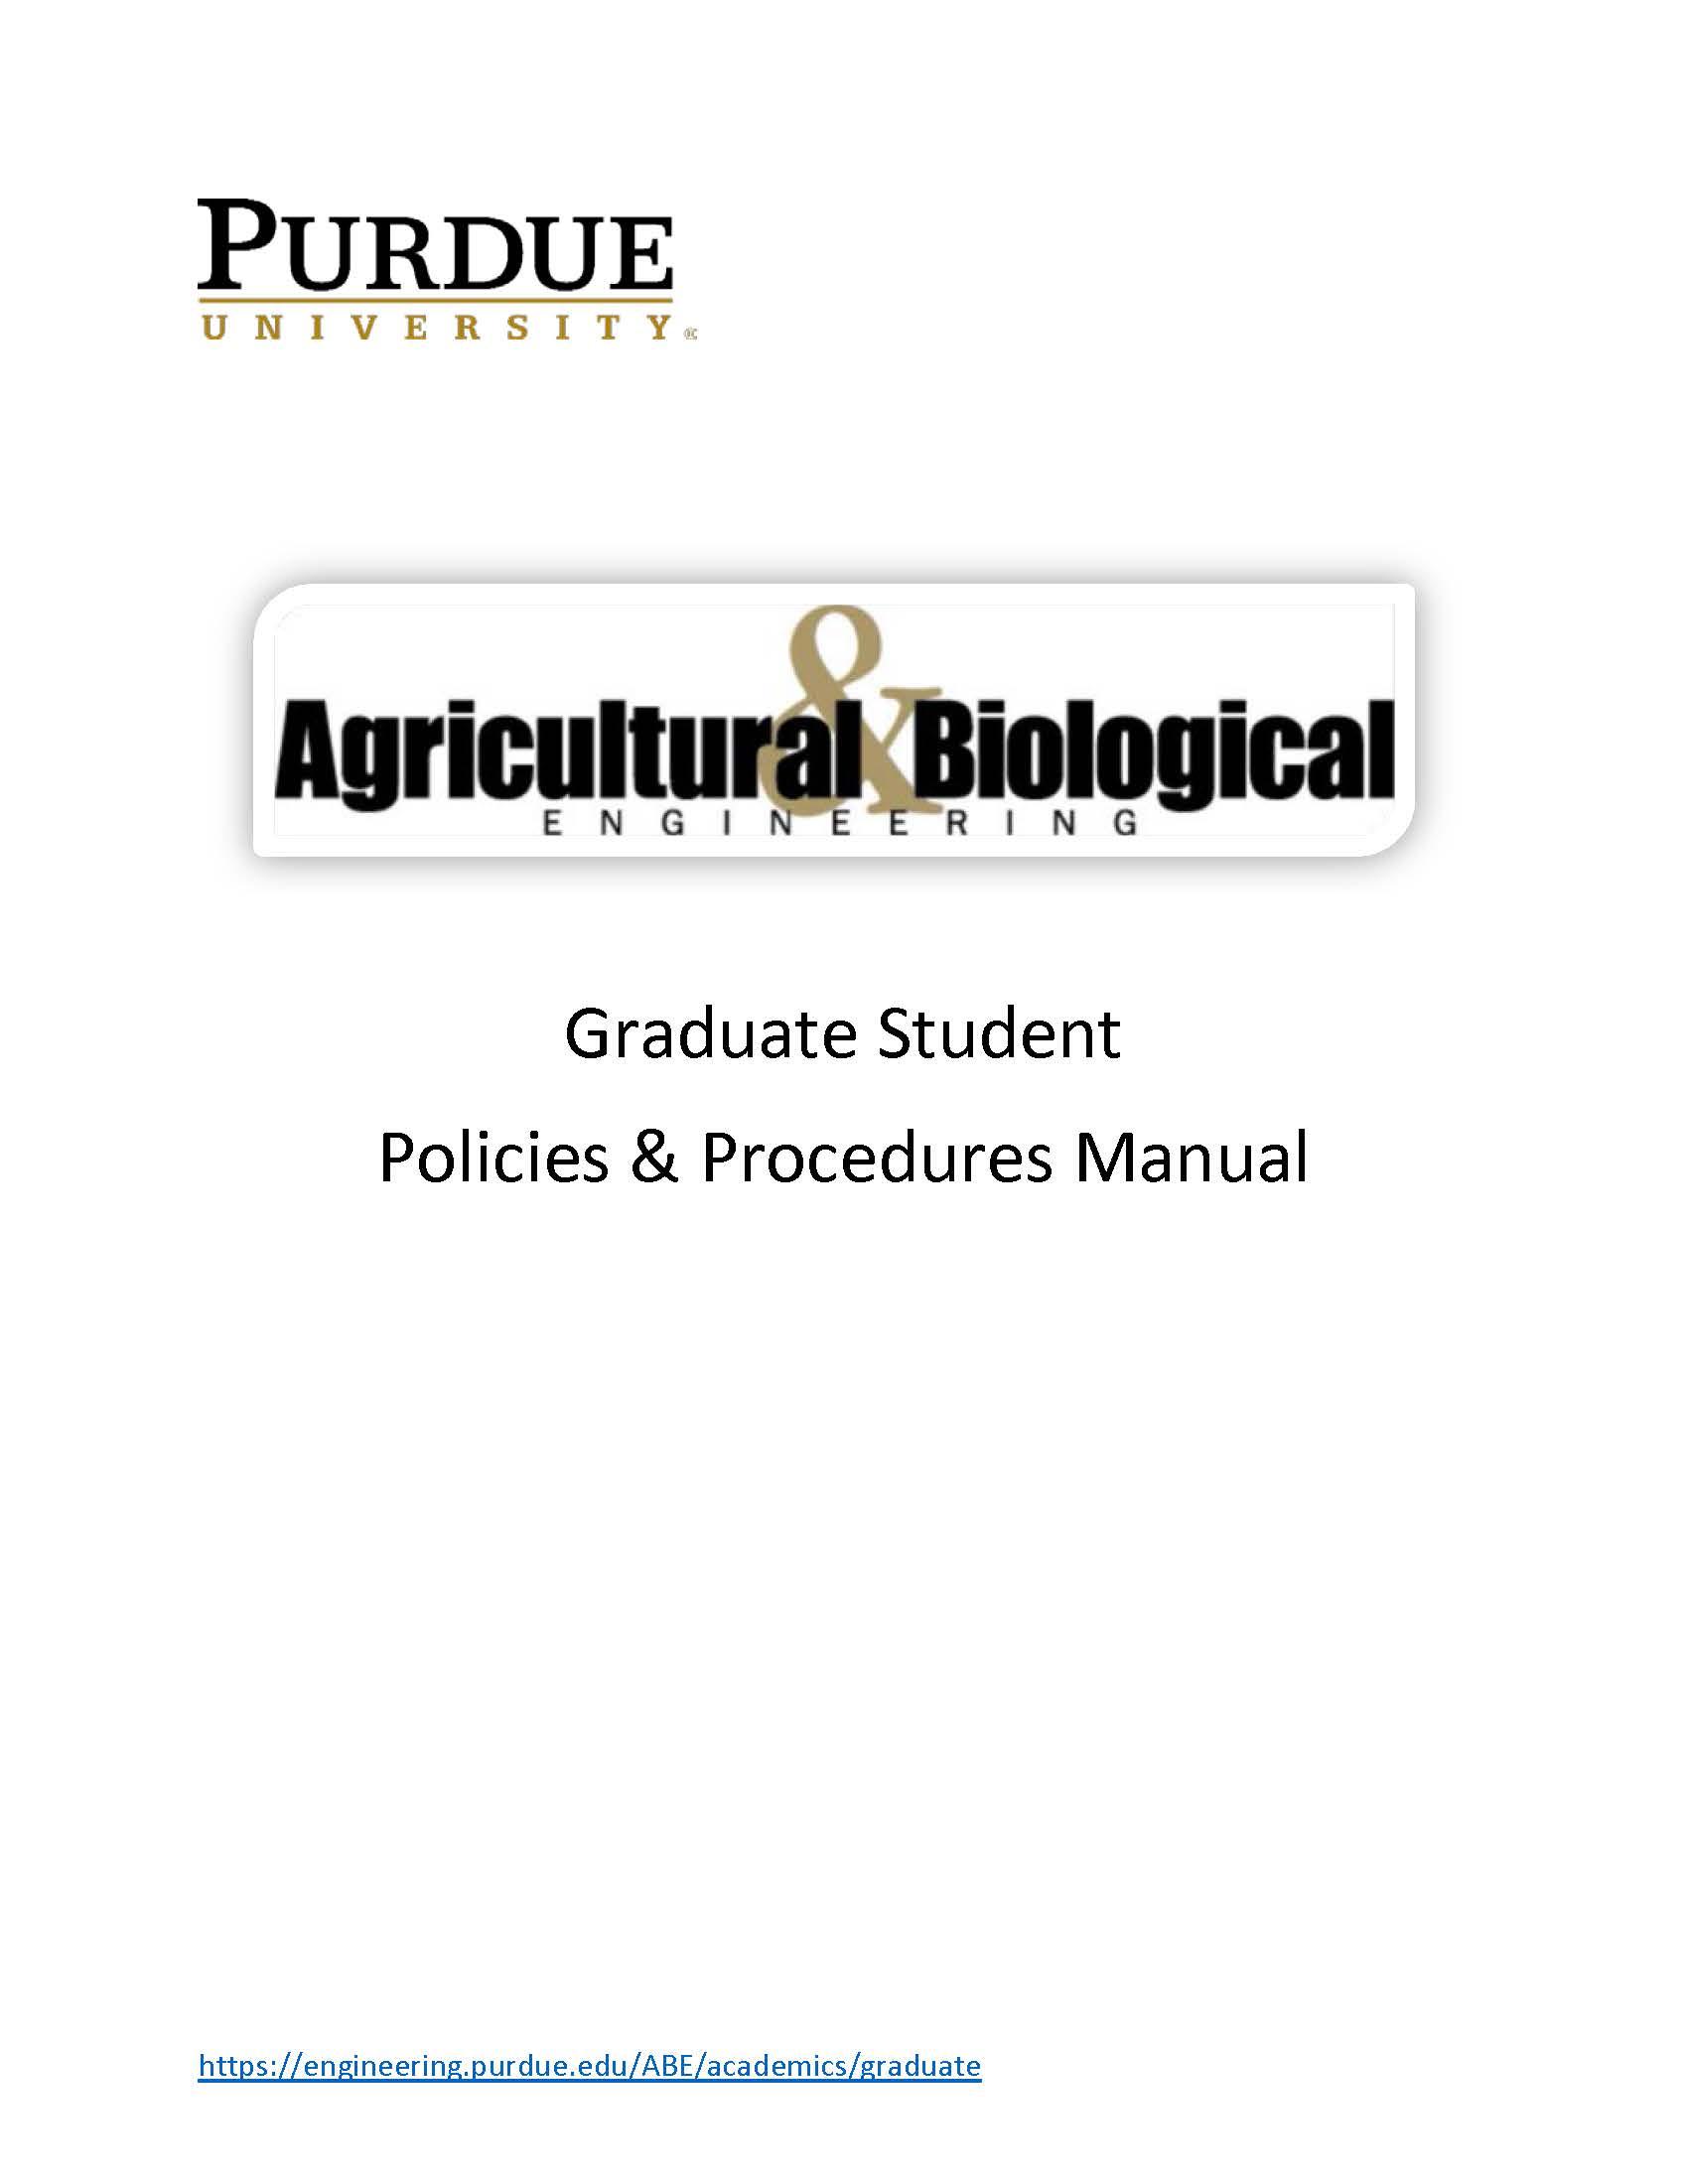 Graduate Student Manual - Agricultural & Biological Engineering - Purdue  University